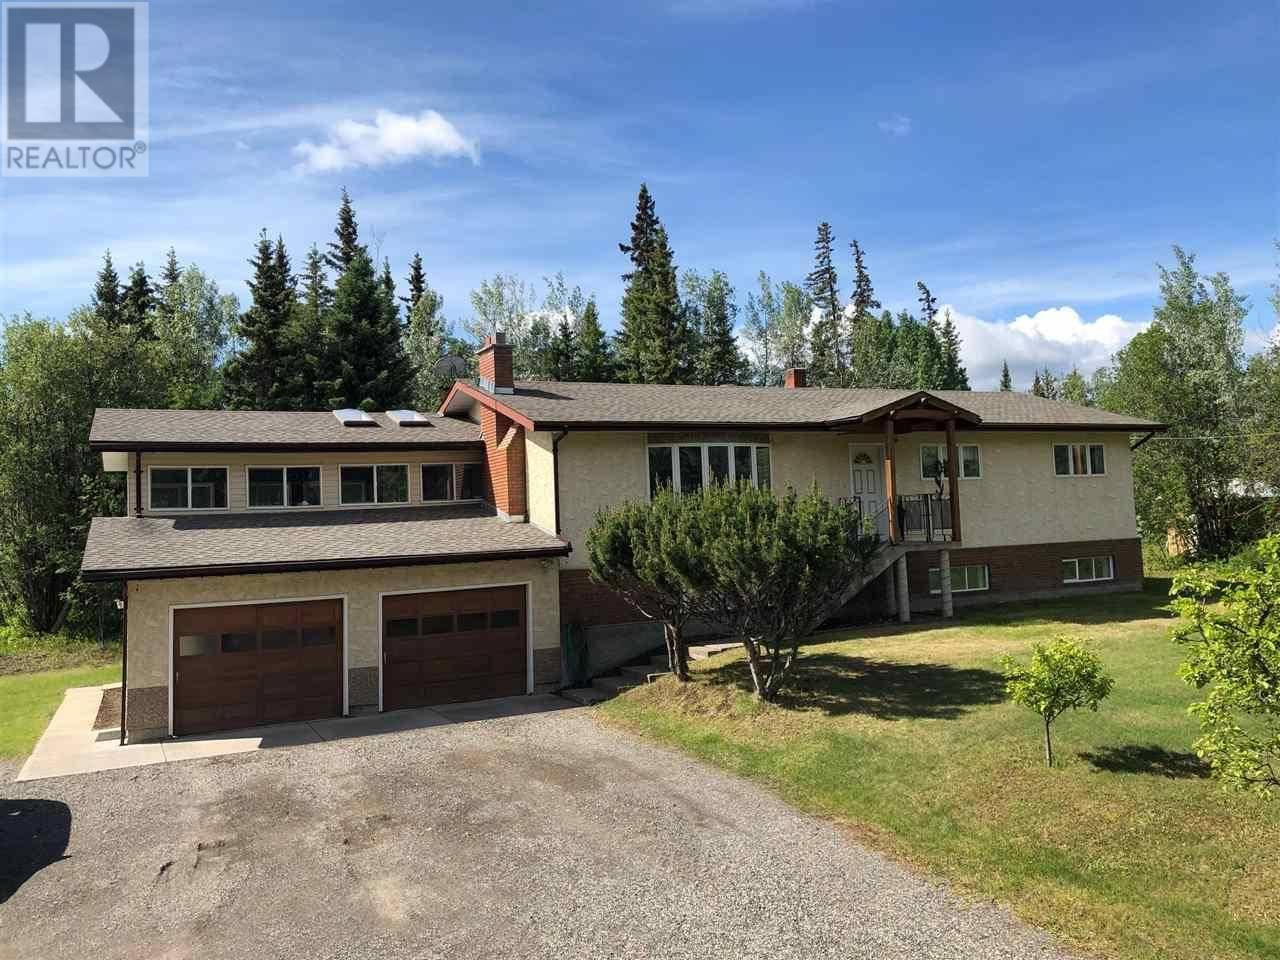 House for sale at 552 Nechako Ave Vanderhoof British Columbia - MLS: R2430763